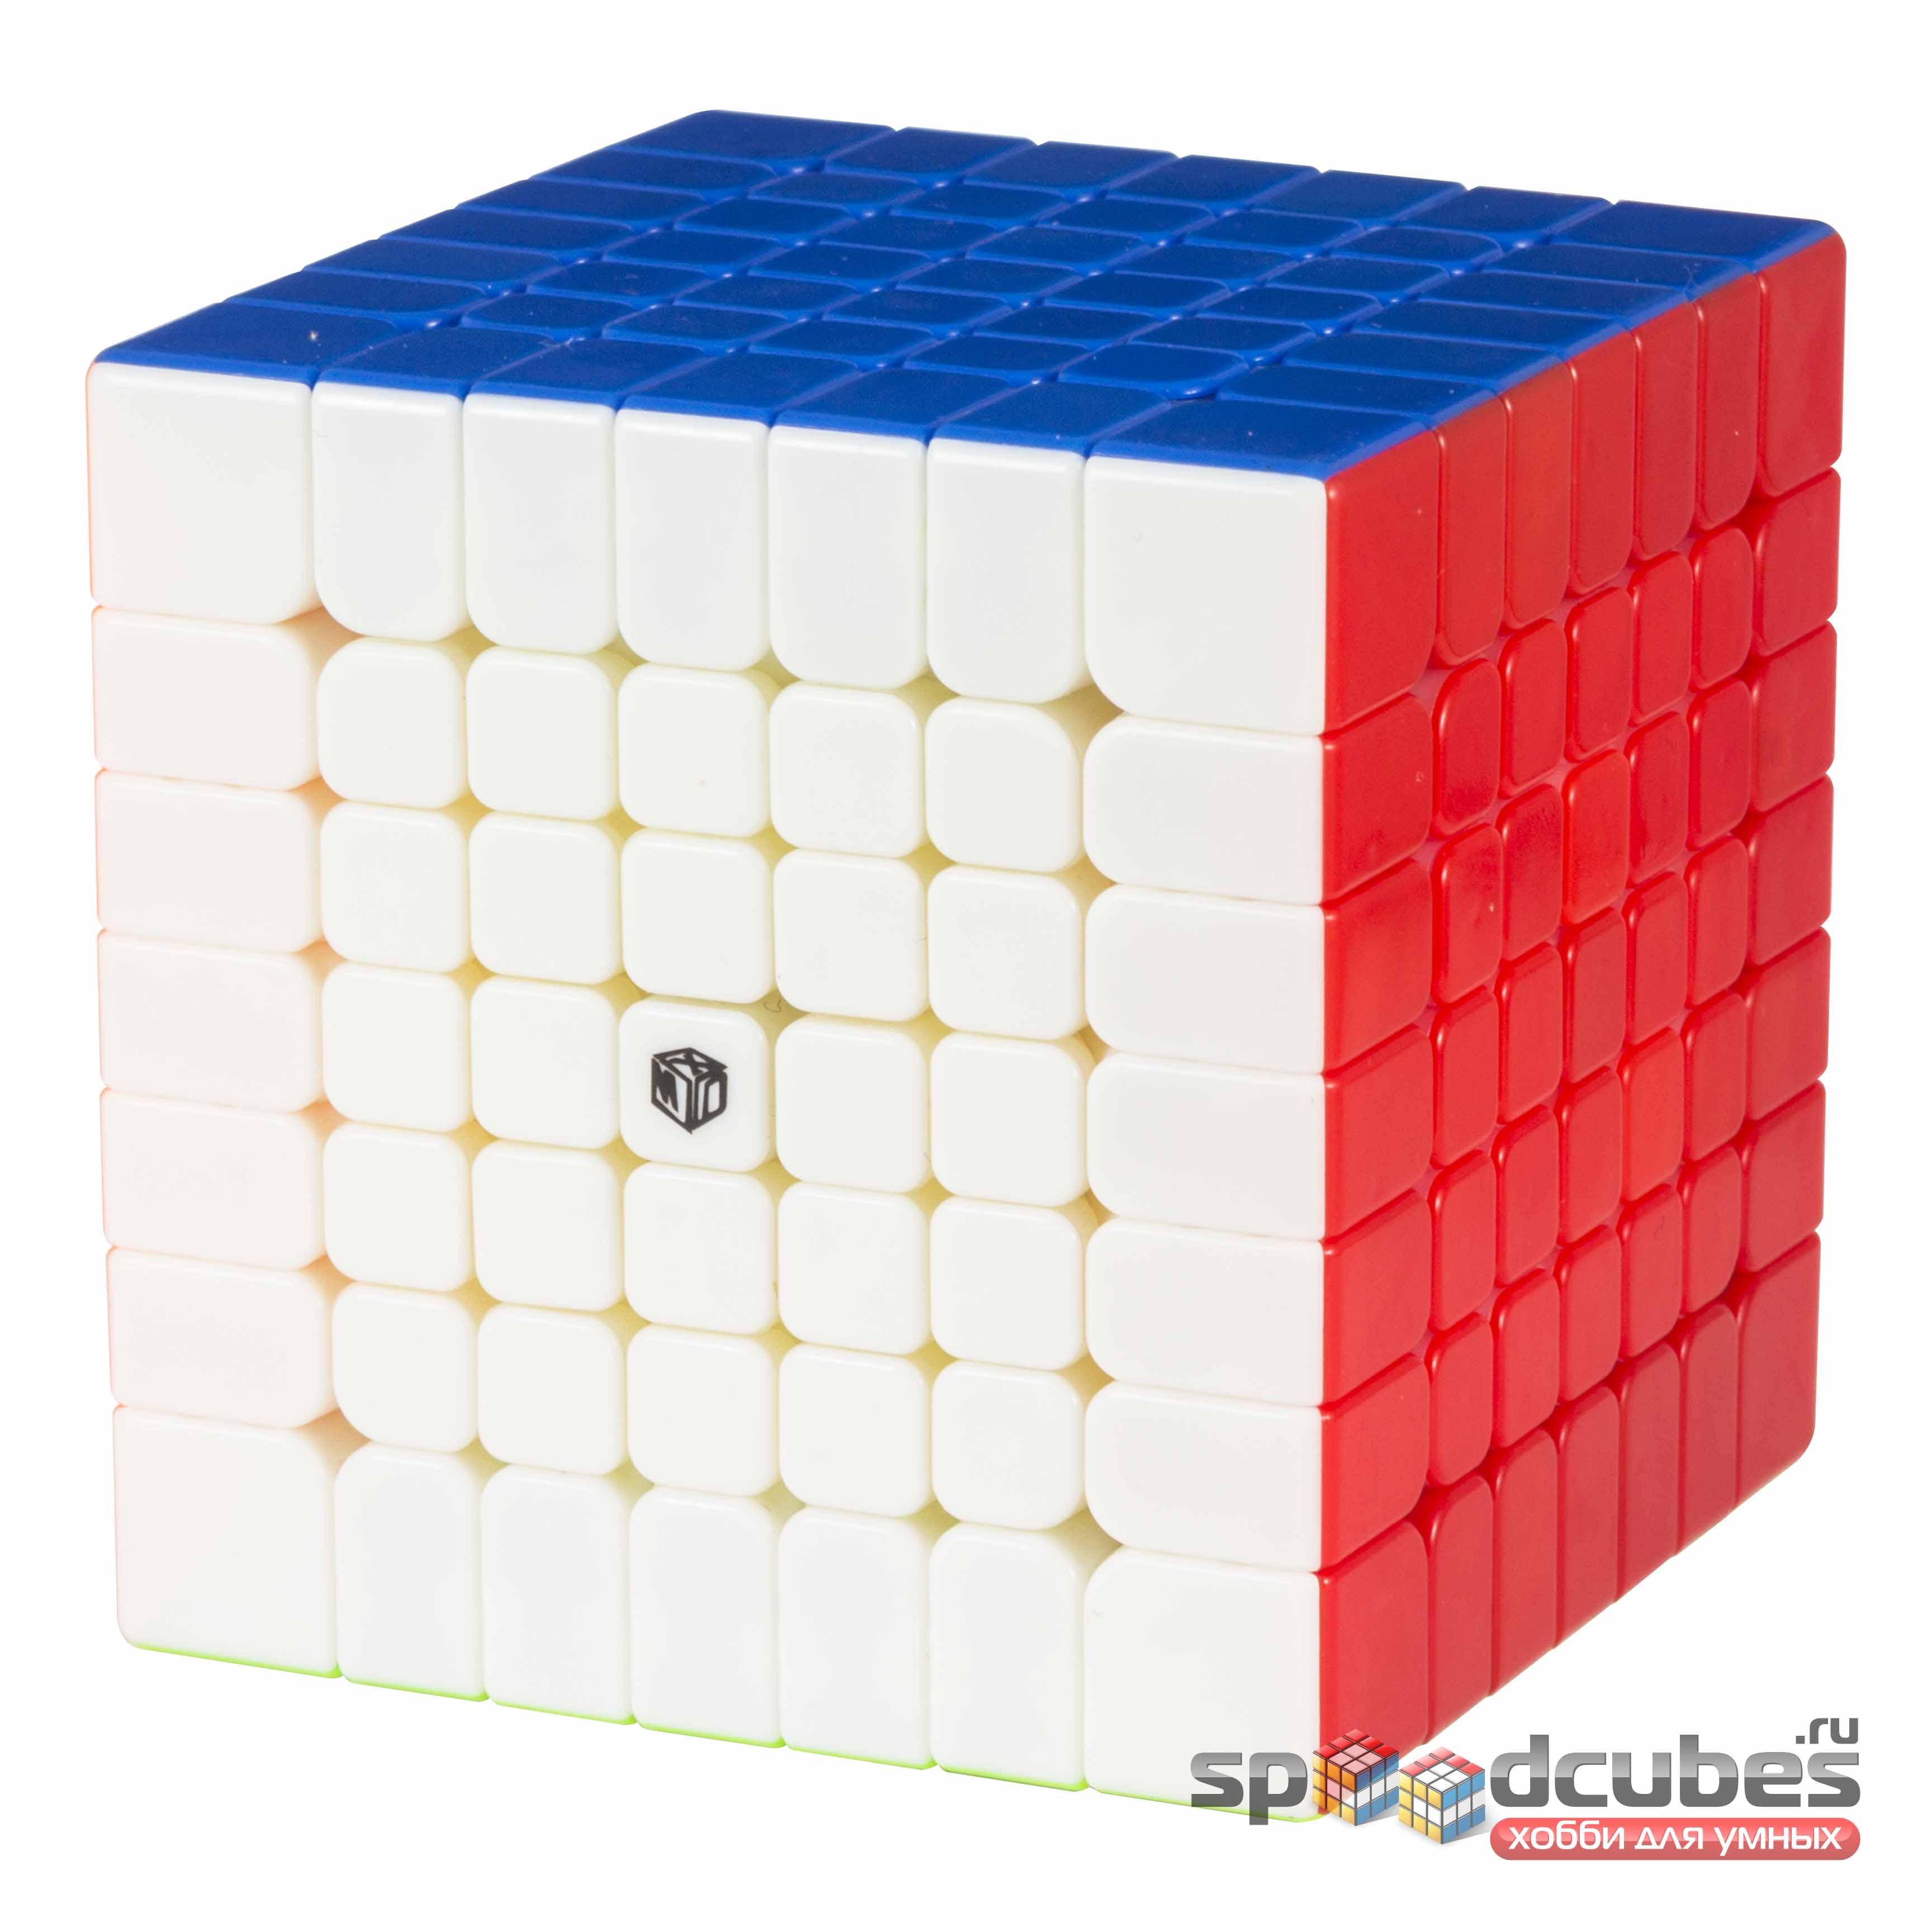 QiYi (MoFangGe) 7x7 Spark Color 2